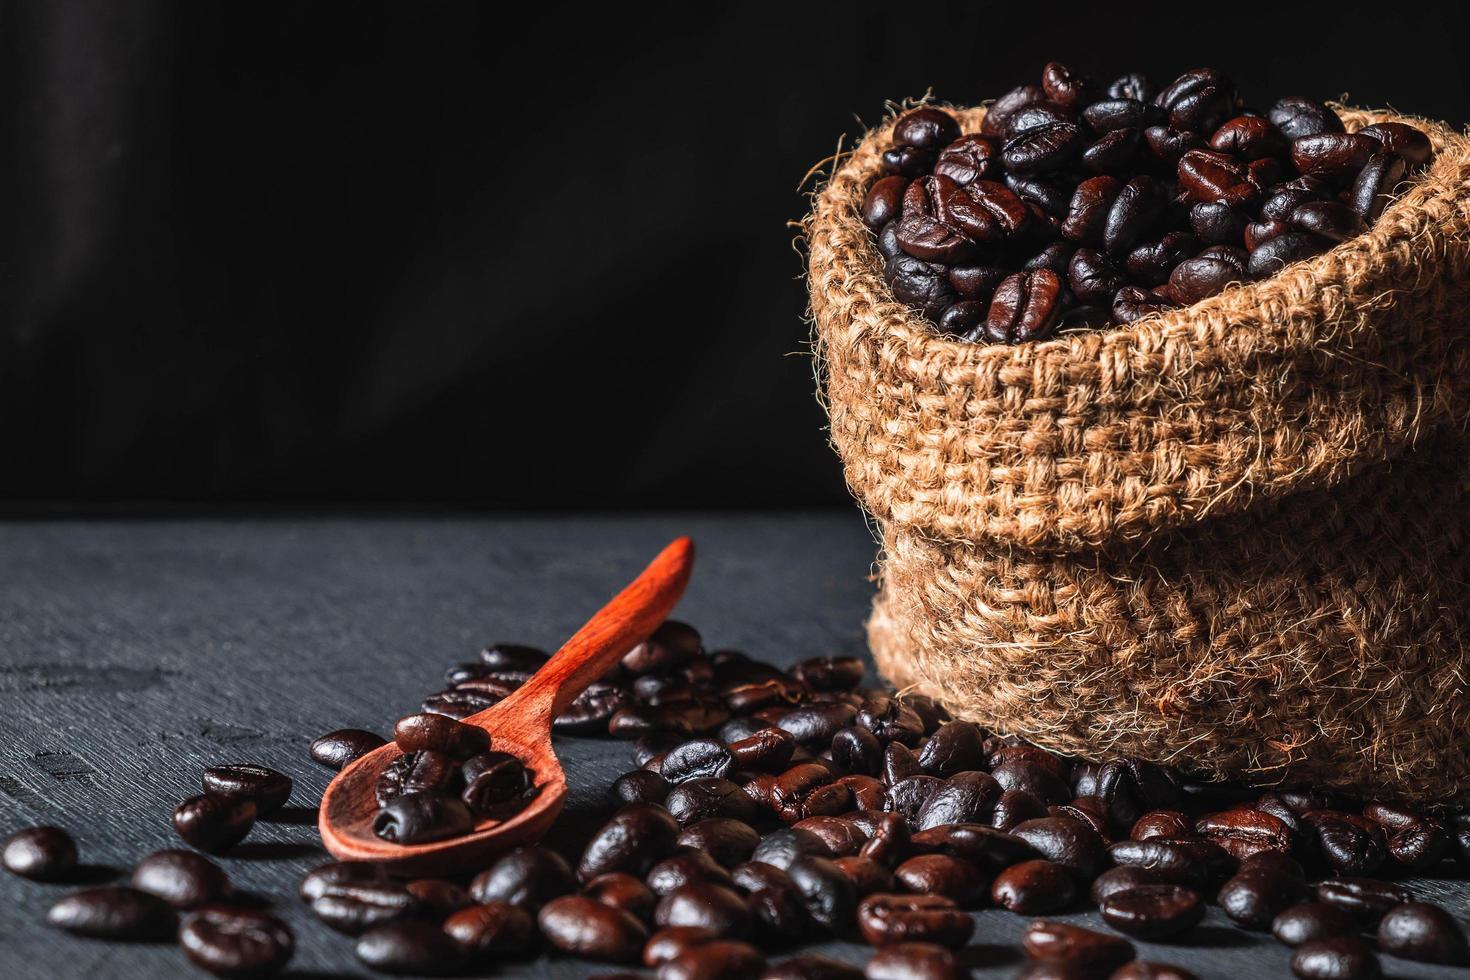 Raw coffee beans in a sack bag photo